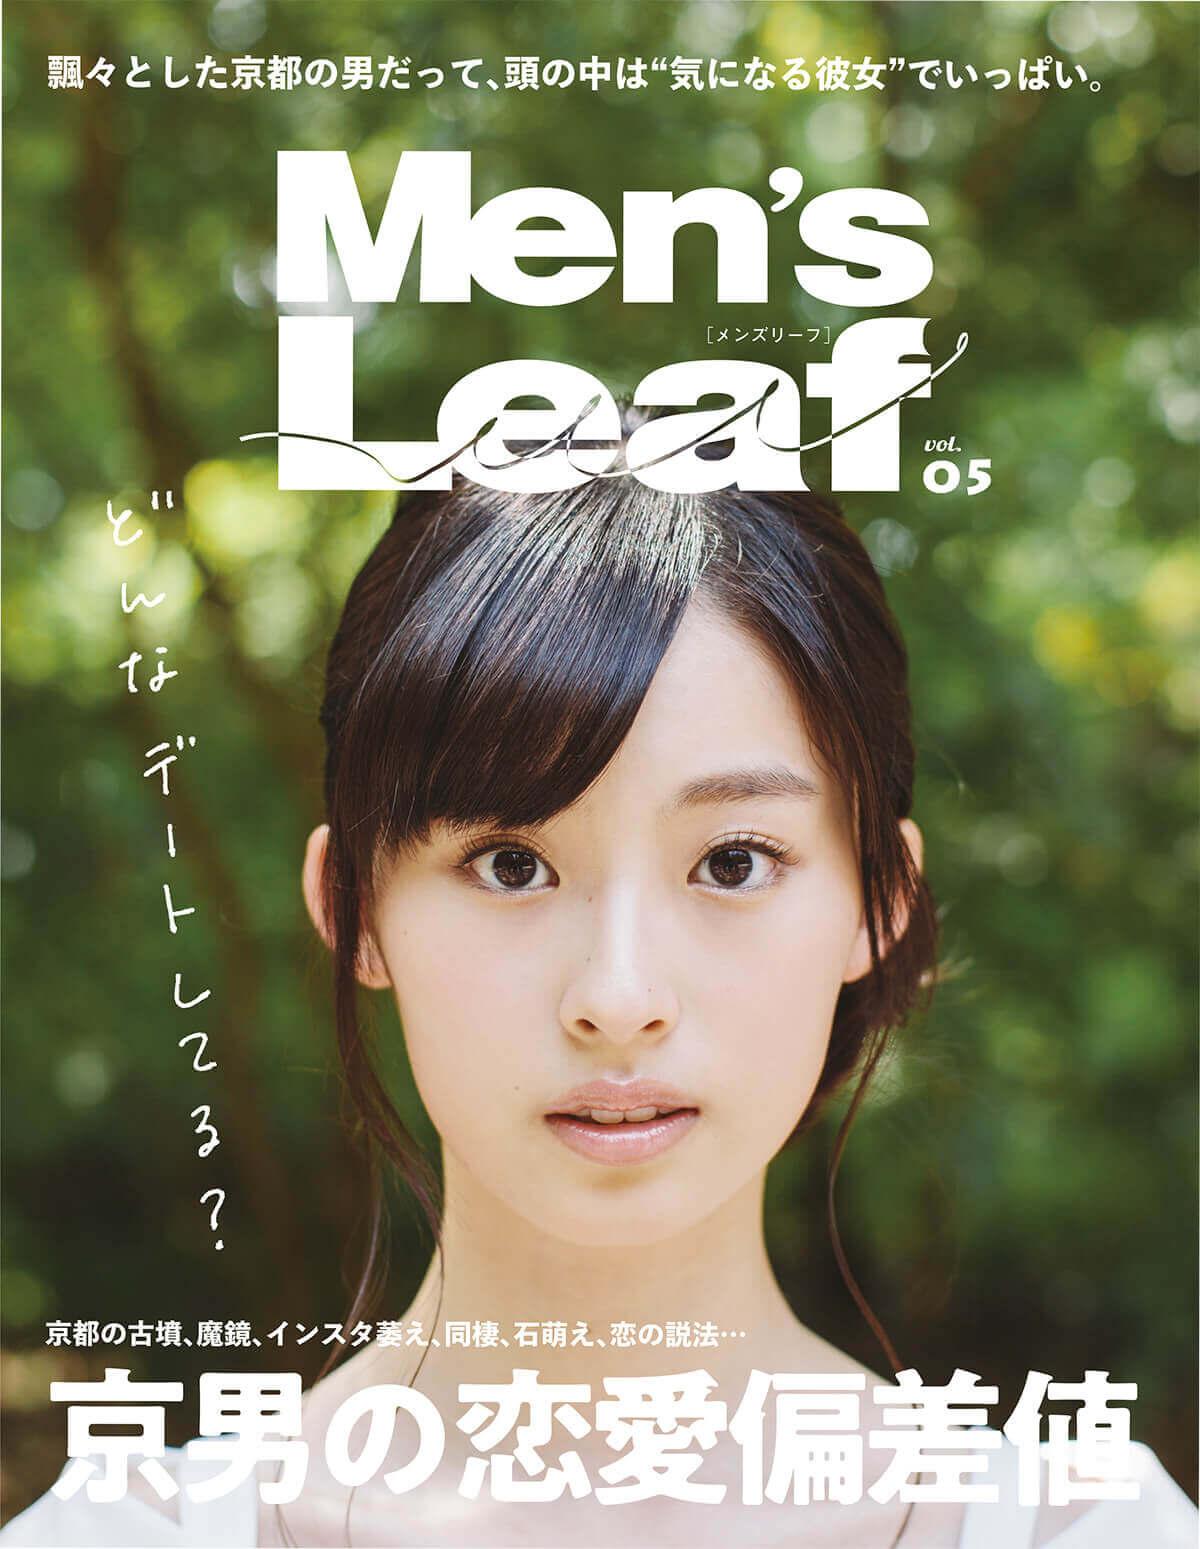 LeafMOOK 【書籍】Men's Leaf vol.05 京男の恋愛偏差値